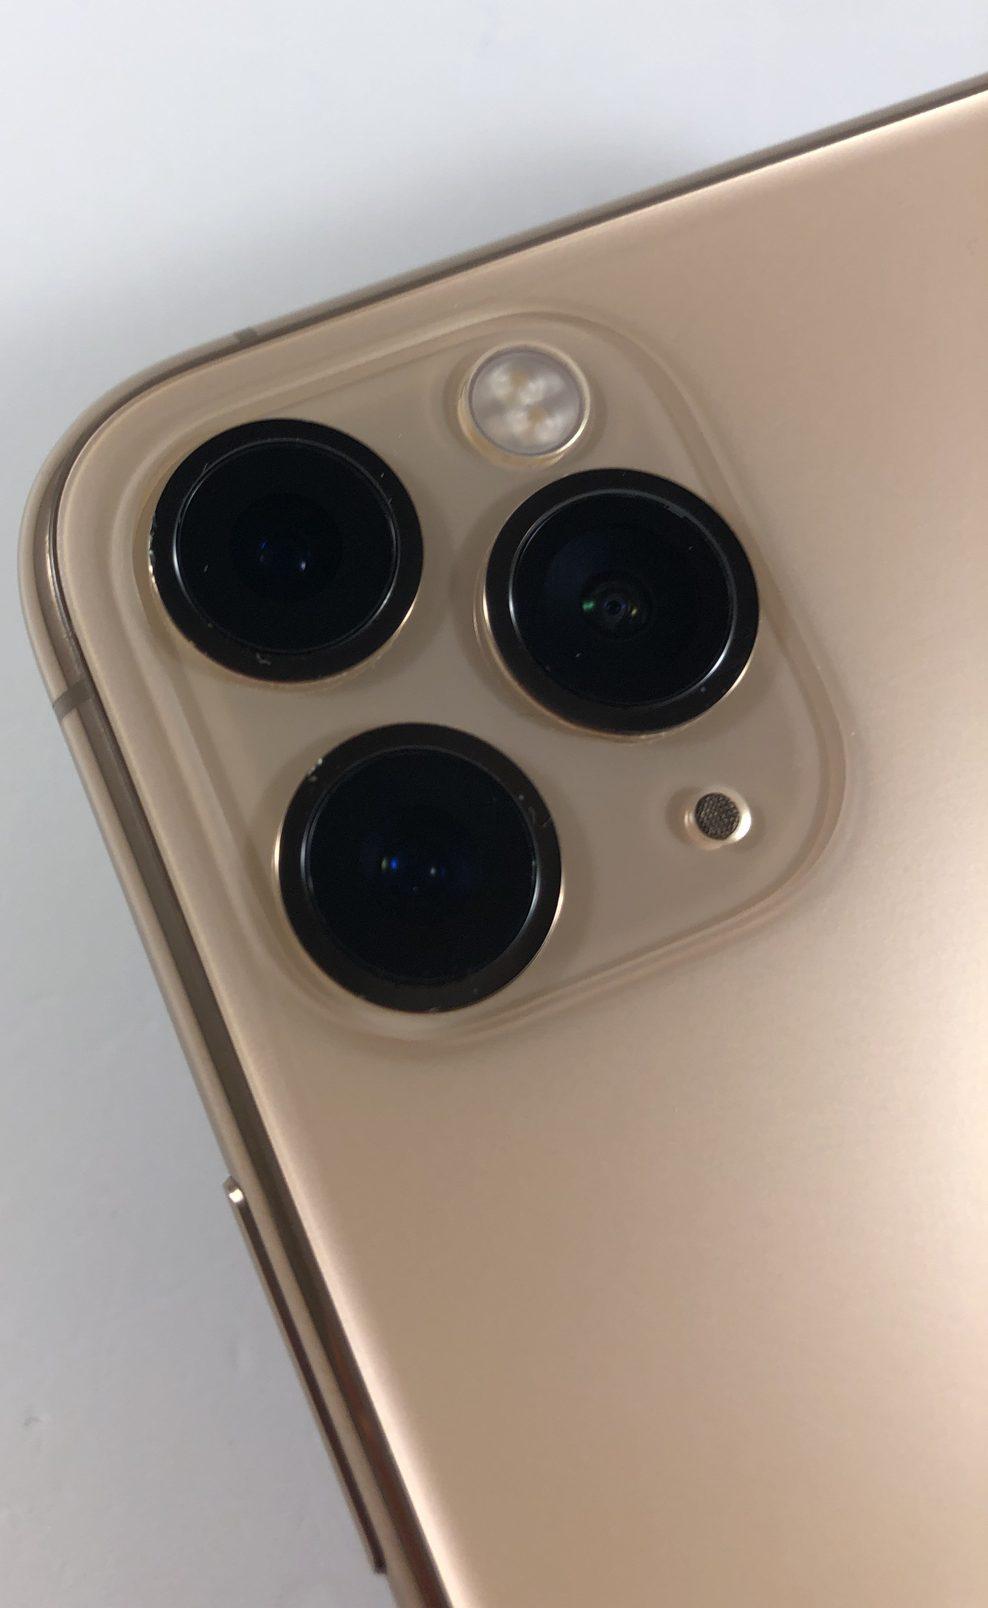 iPhone 11 Pro Max 256GB, 256GB, Gold, image 3